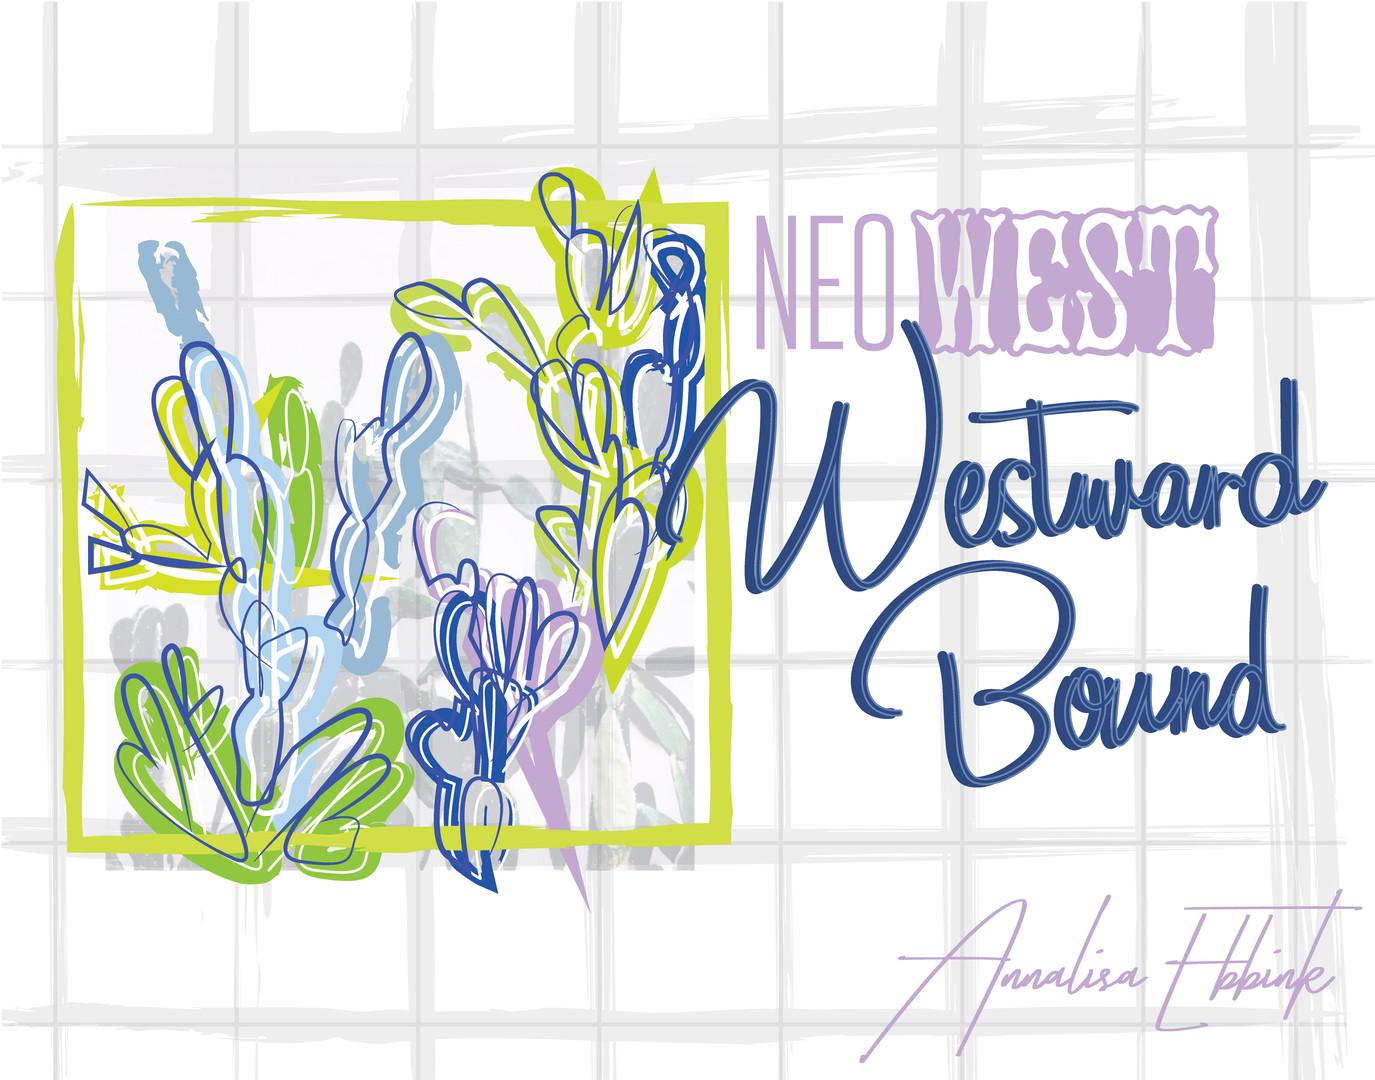 Westward Bound FINAL Cover, Mood, Etc-05